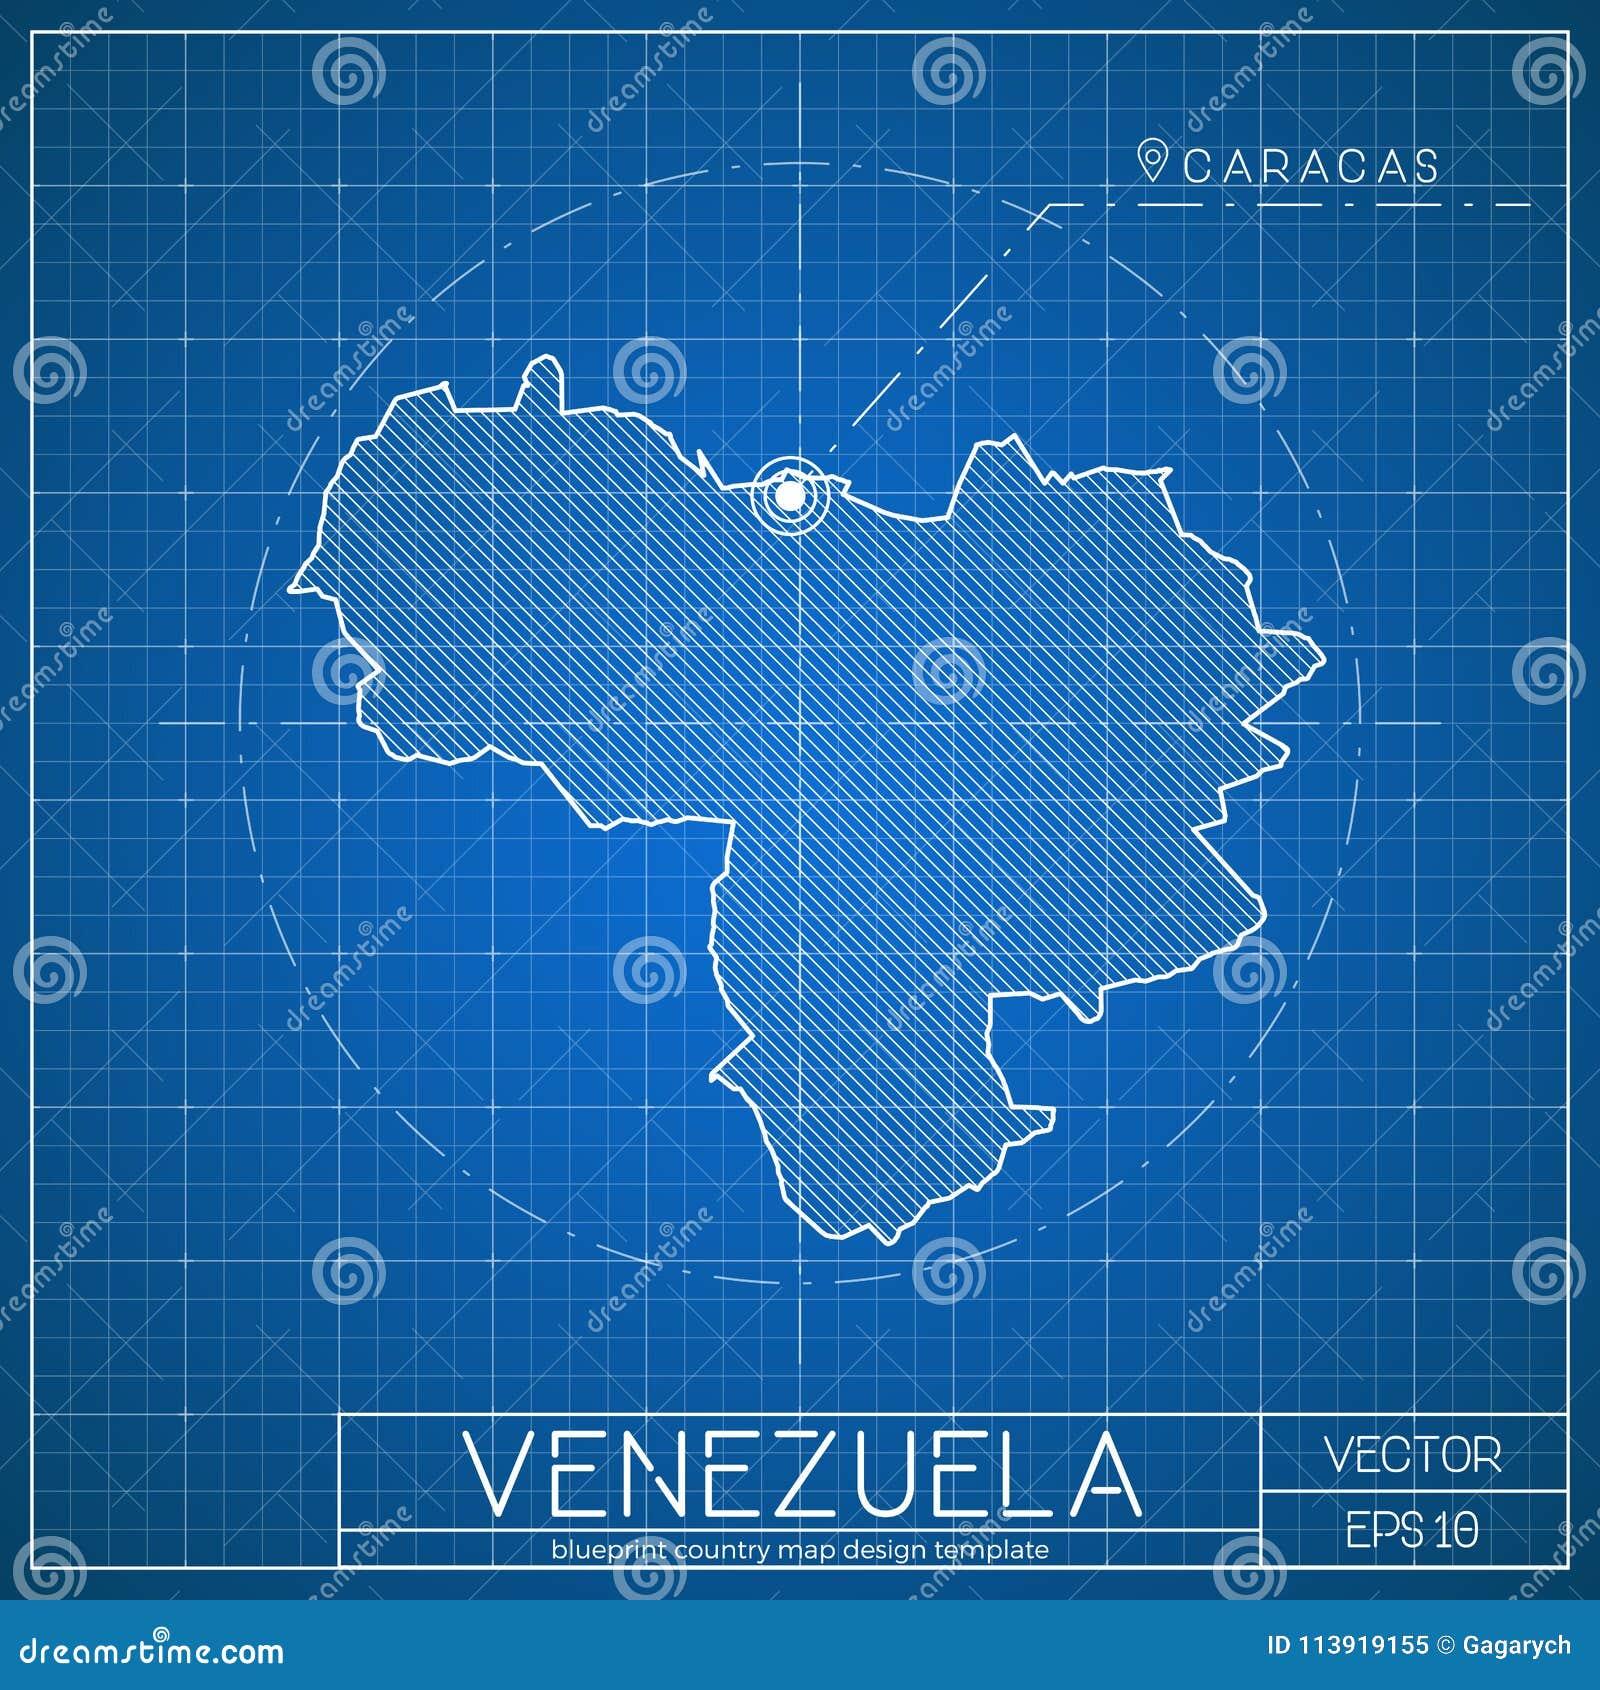 venezuela blueprint map template with capital stock vector